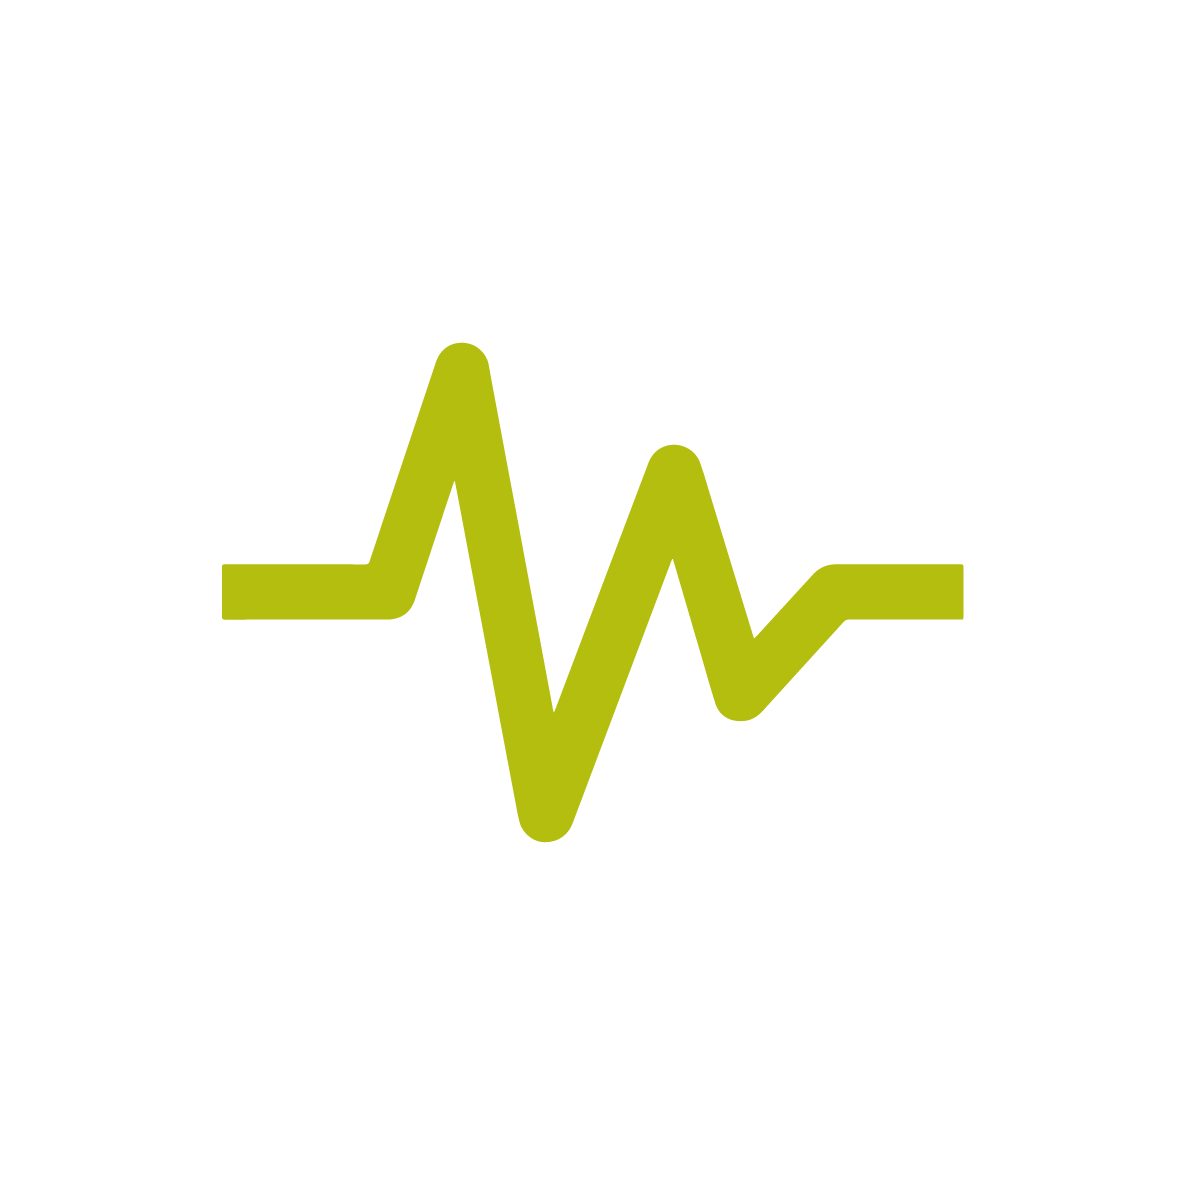 vital signs measurement green